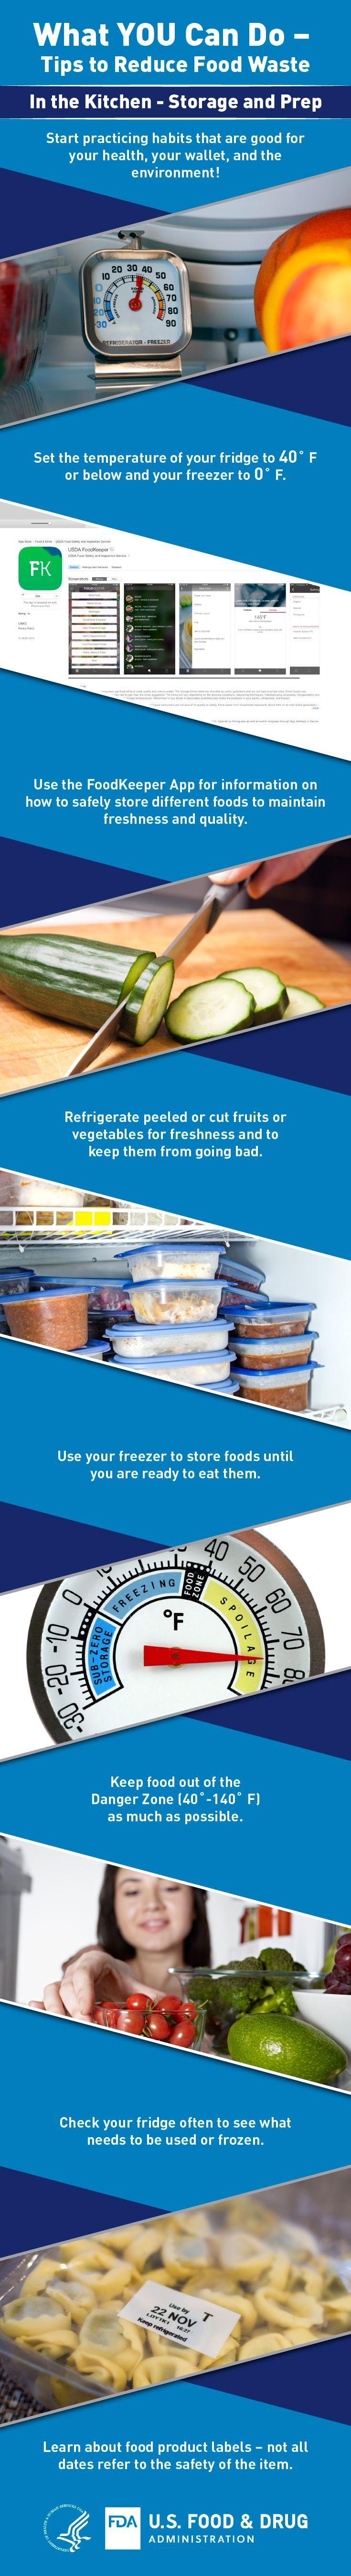 22 best Food Safety images on Pinterest | Foodborne illness ...